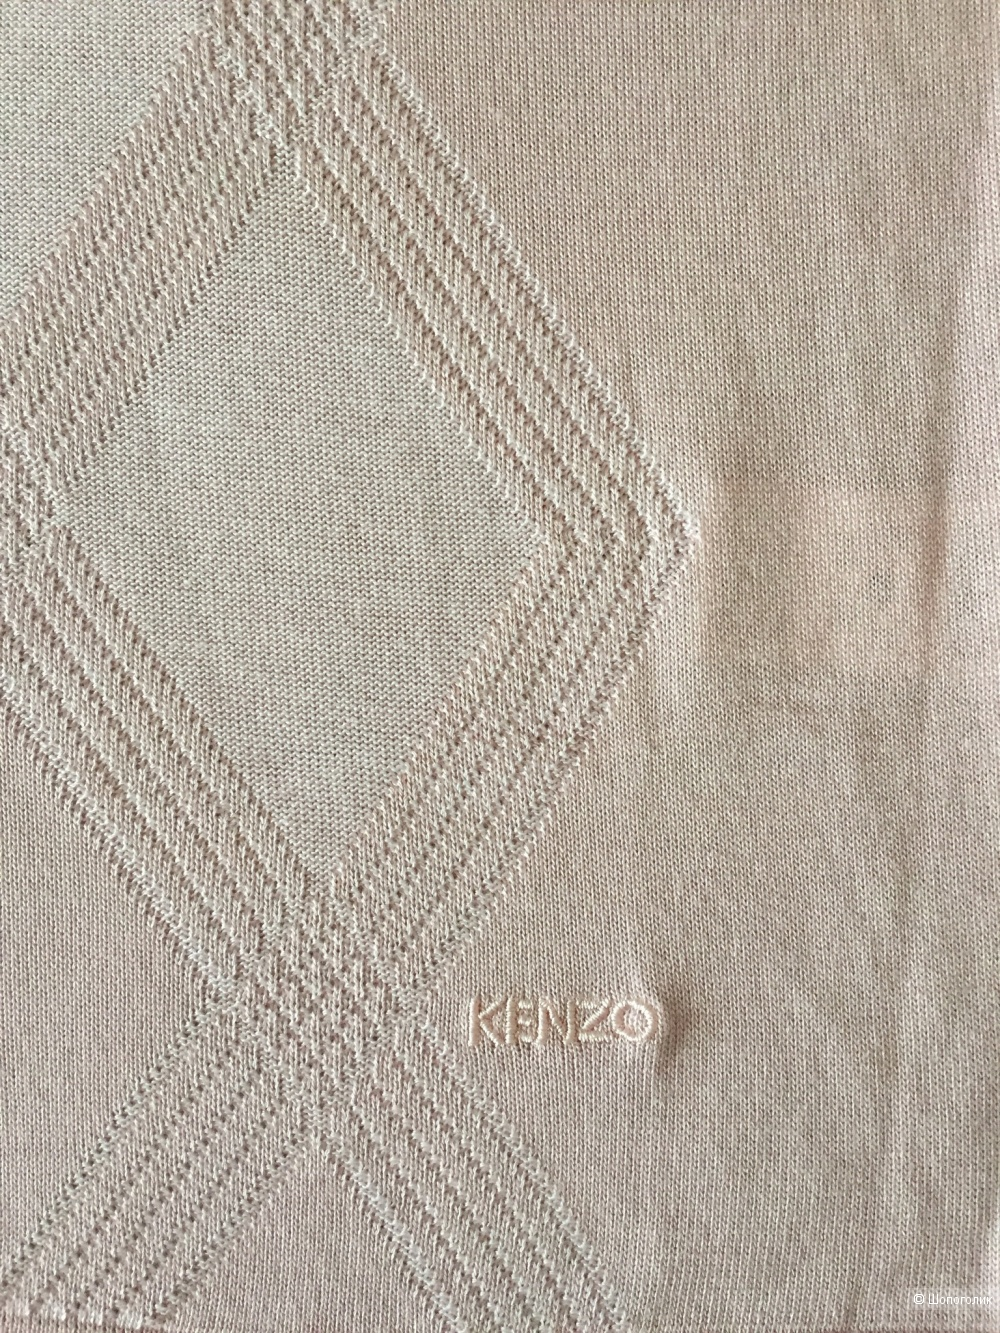 Джемпер Kenzo 50-52 размер